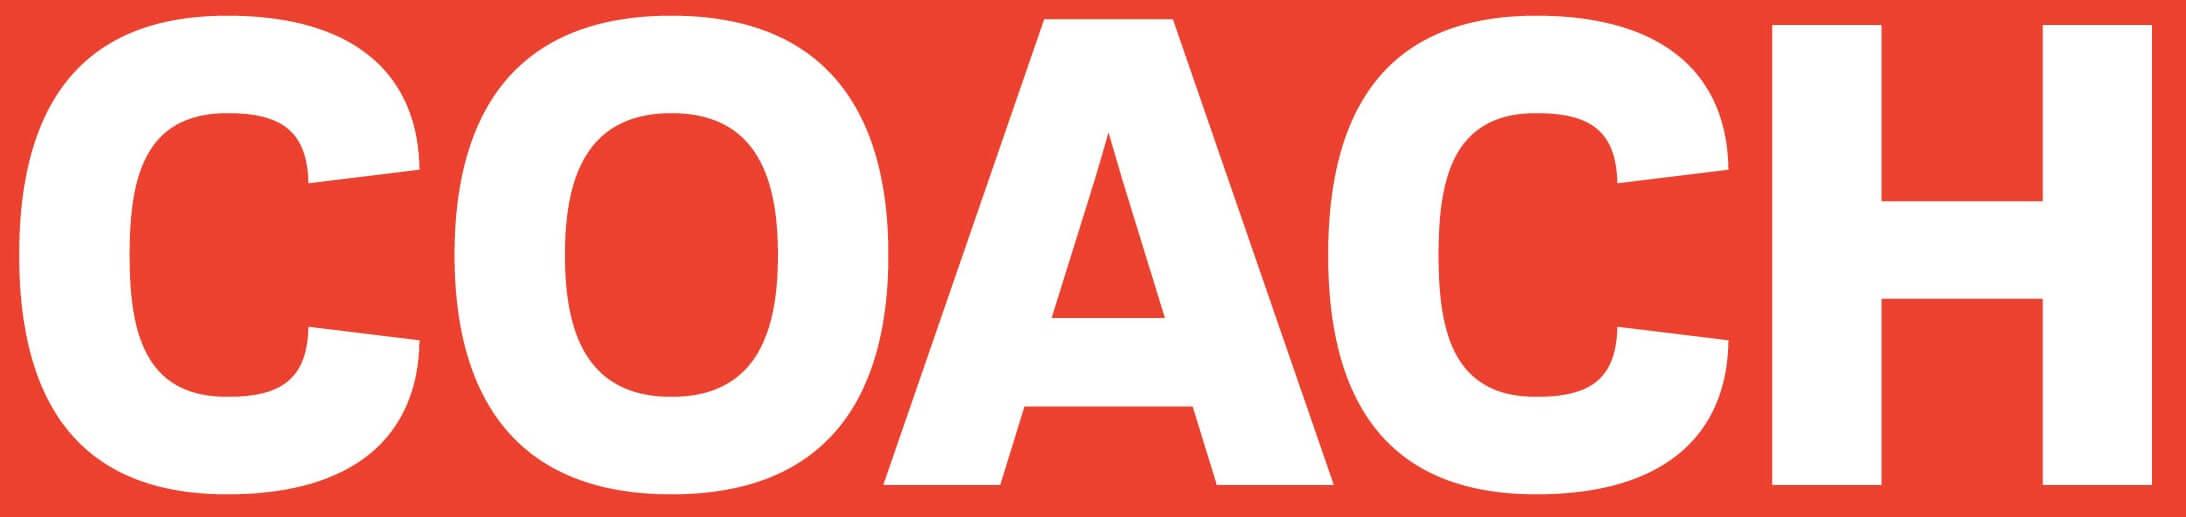 coach mag logo